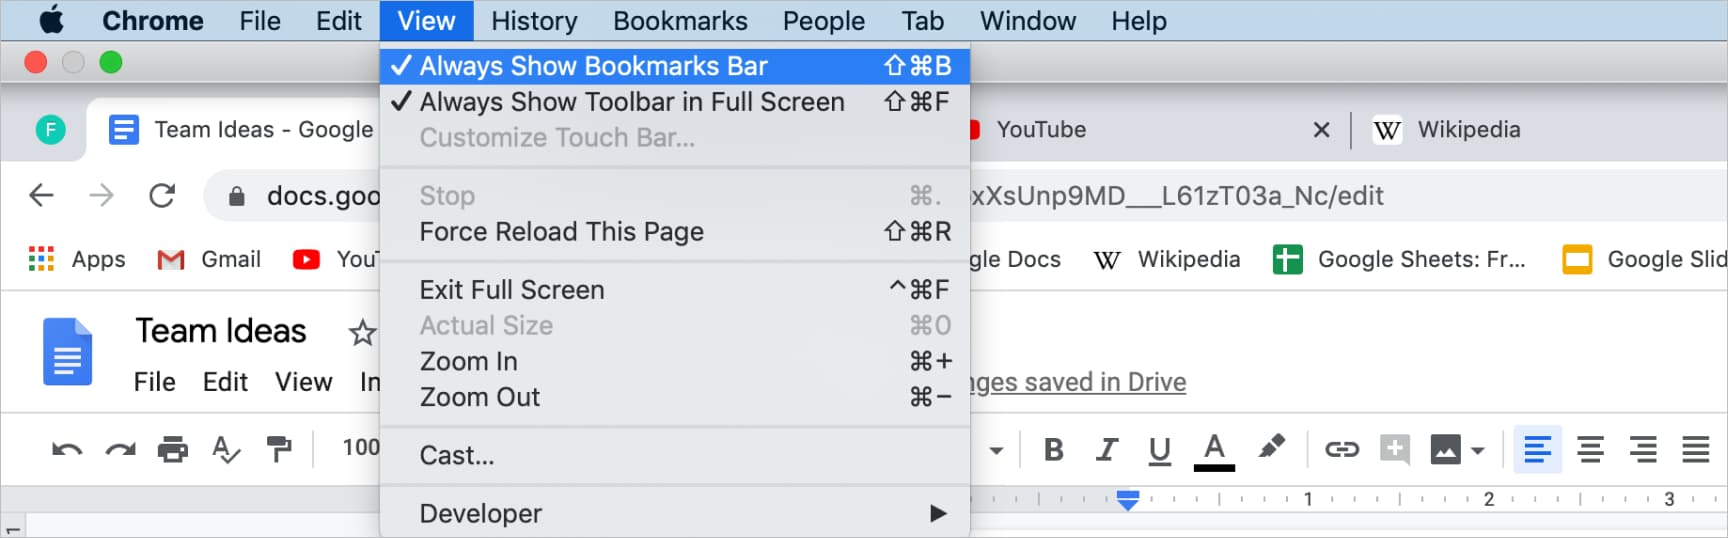 Screenshot of Google Chrome menu option to always show bookmarks bar